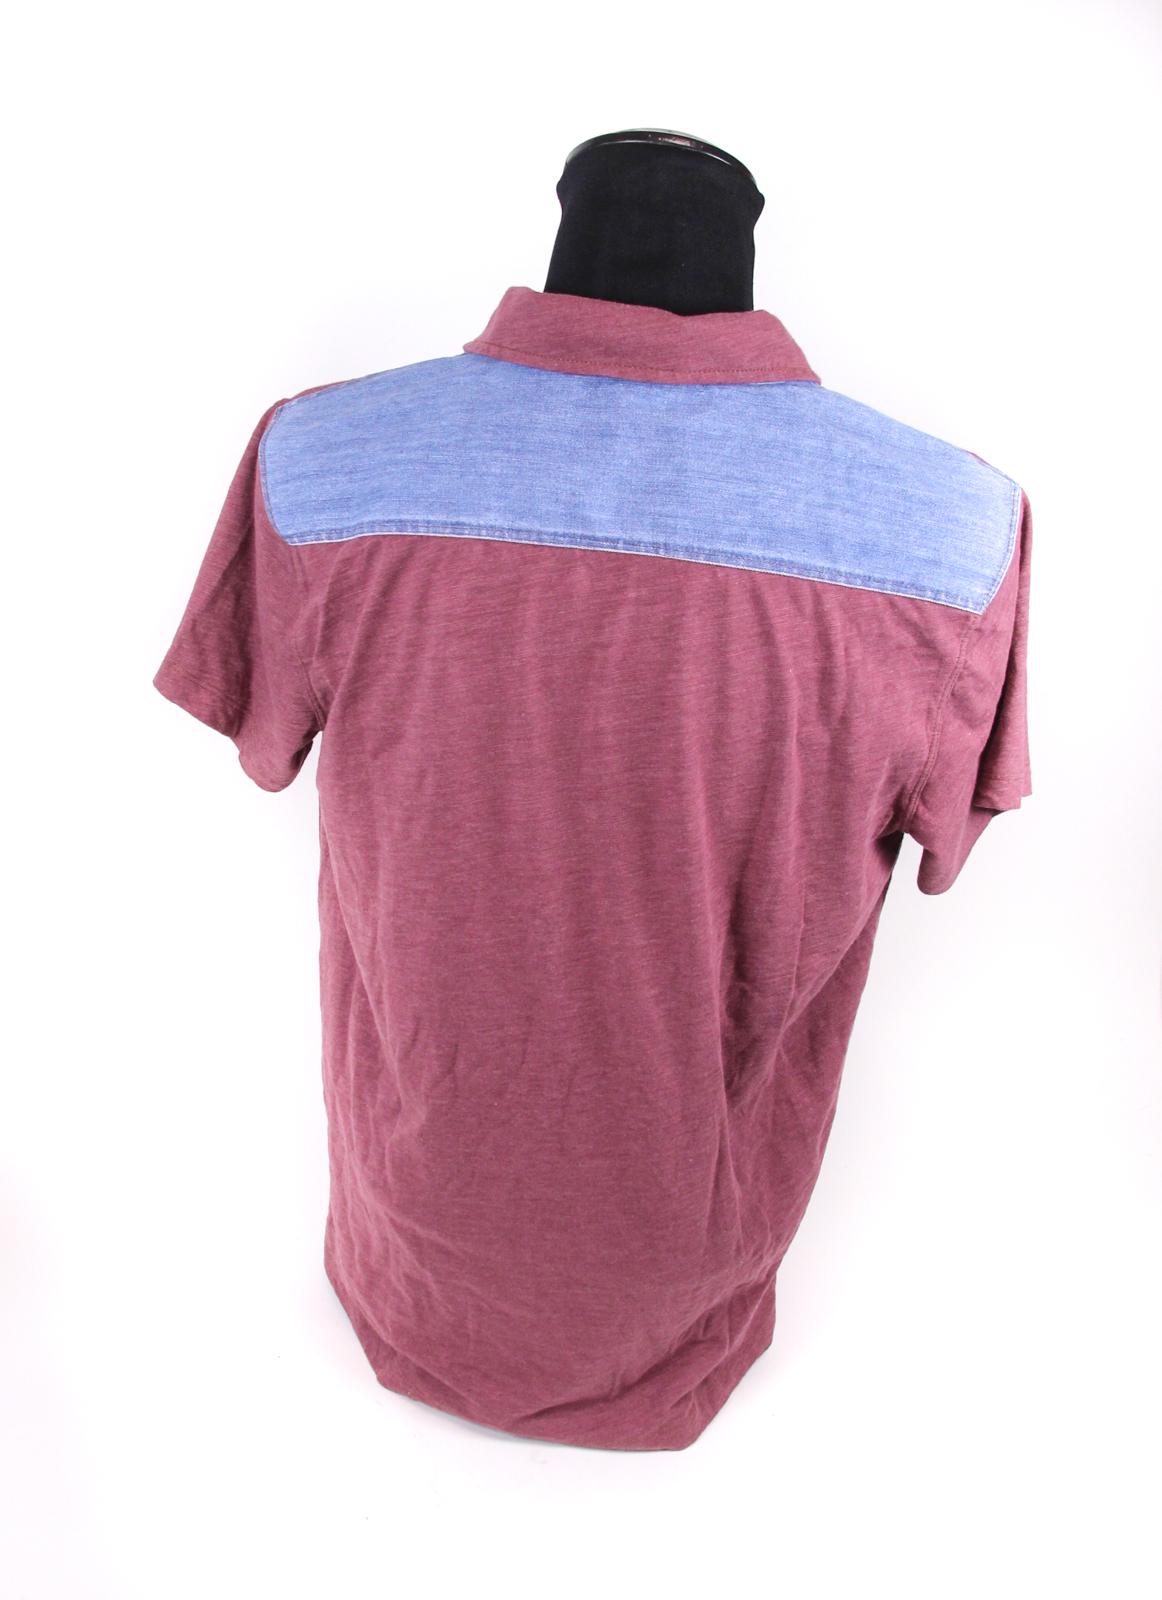 hugo boss herren poloshirt gr l violett rot jeans kurzarm. Black Bedroom Furniture Sets. Home Design Ideas